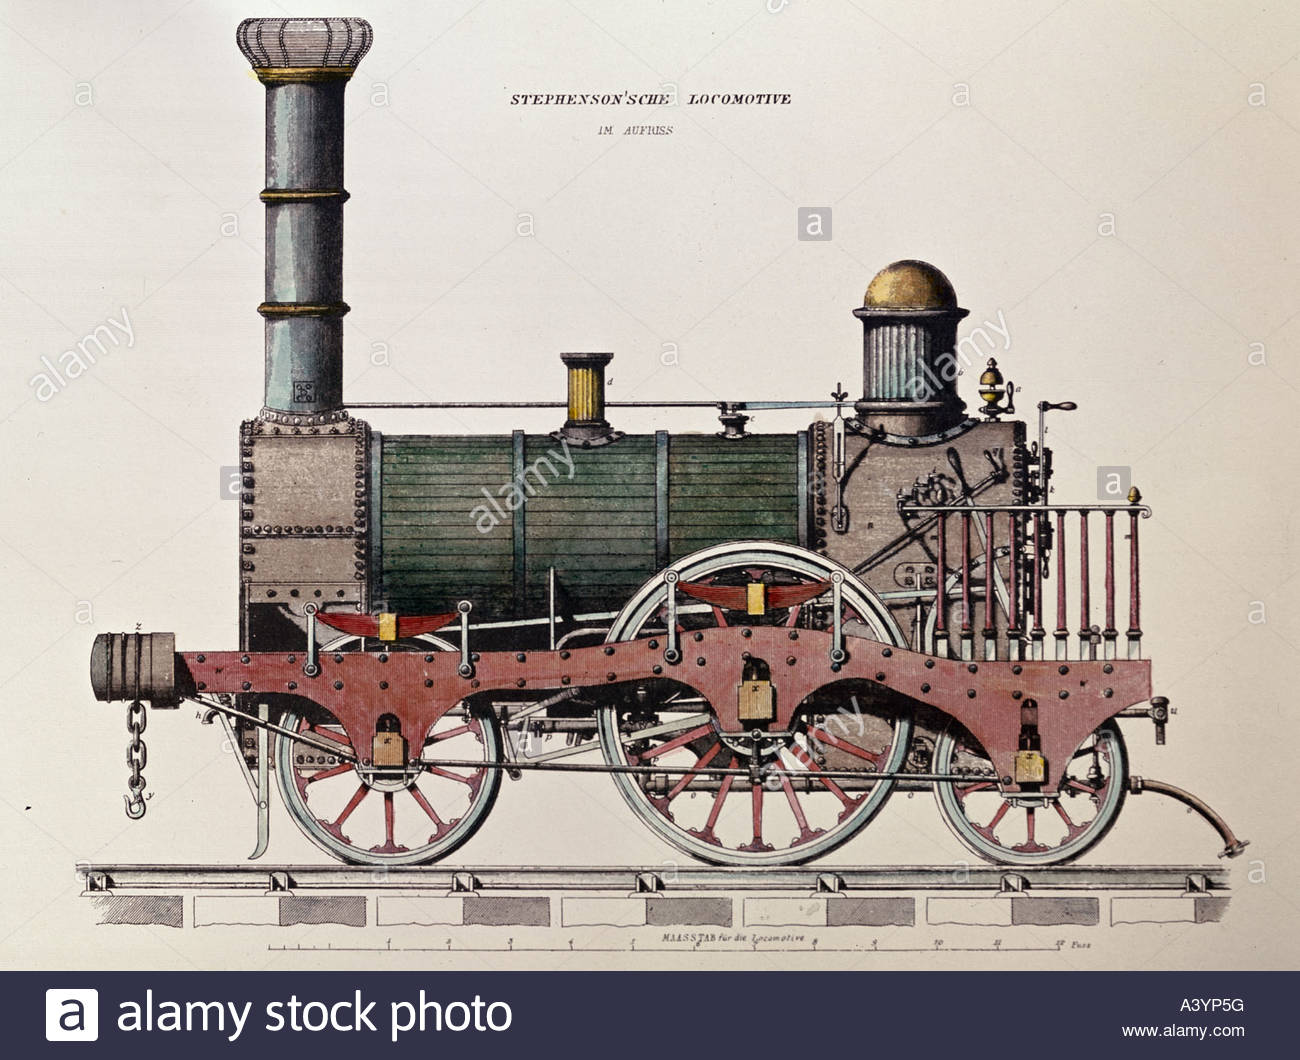 1300x1060 Drawing Stephenson Locomotive Stock Photos Amp Drawing Stephenson